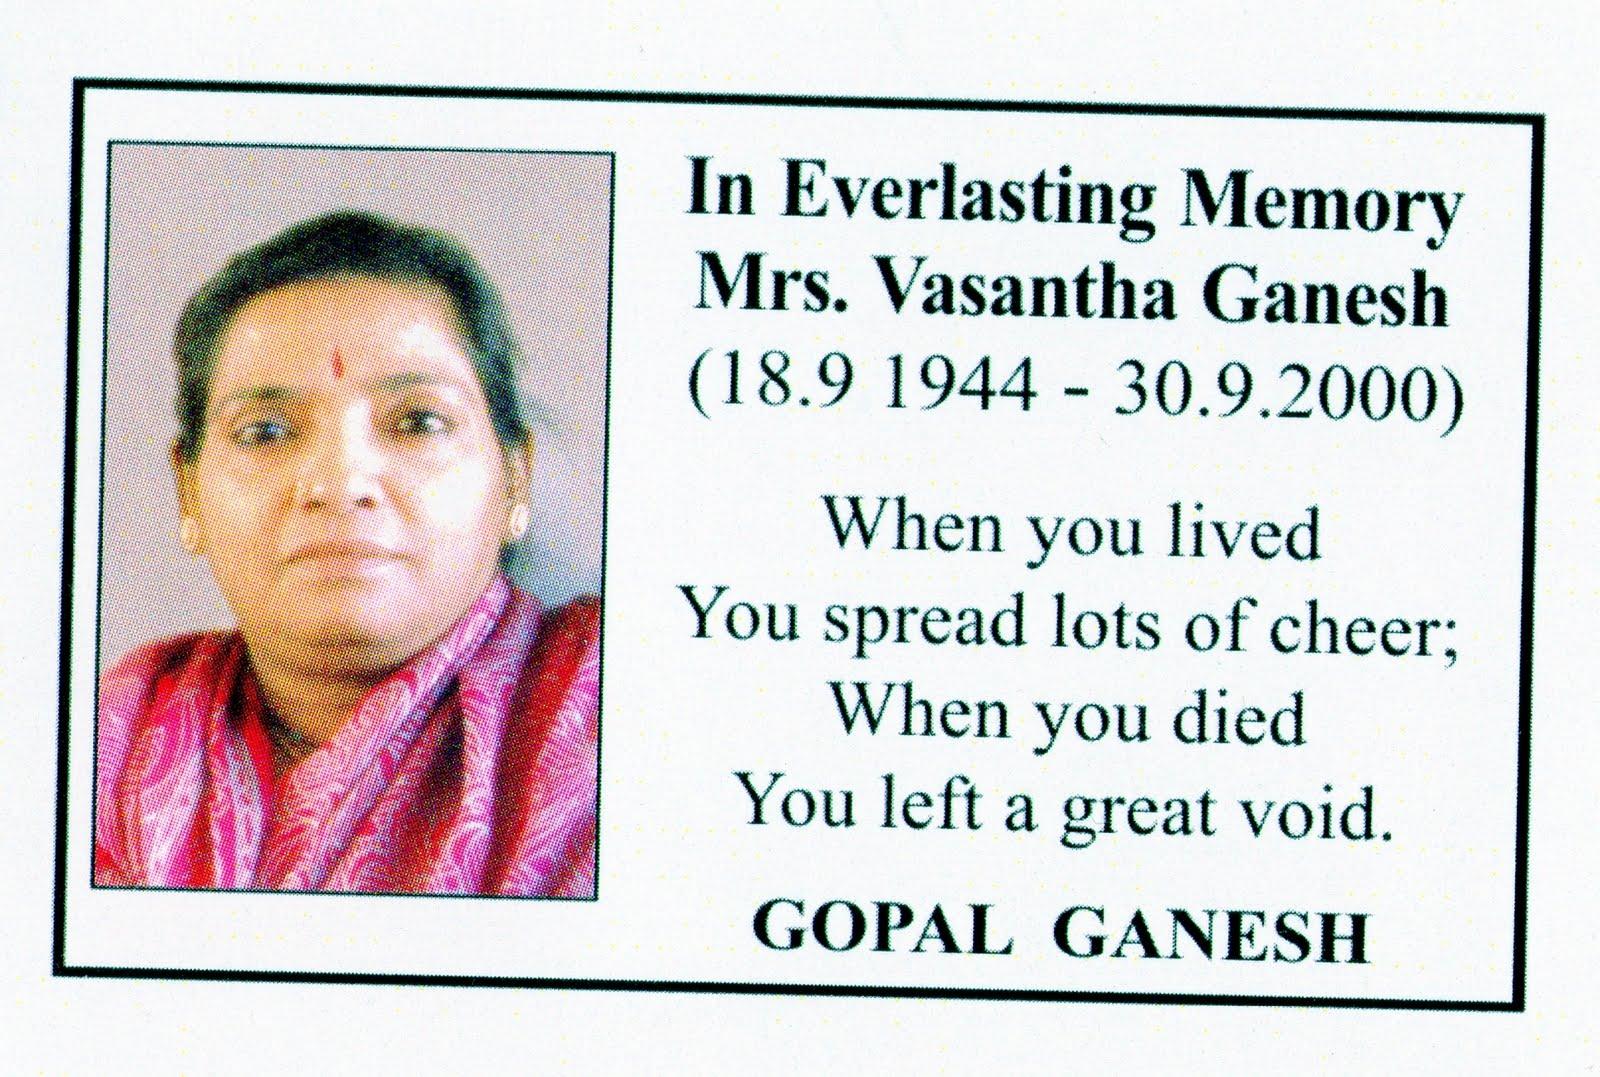 In Memorium Vasantha Ganesh